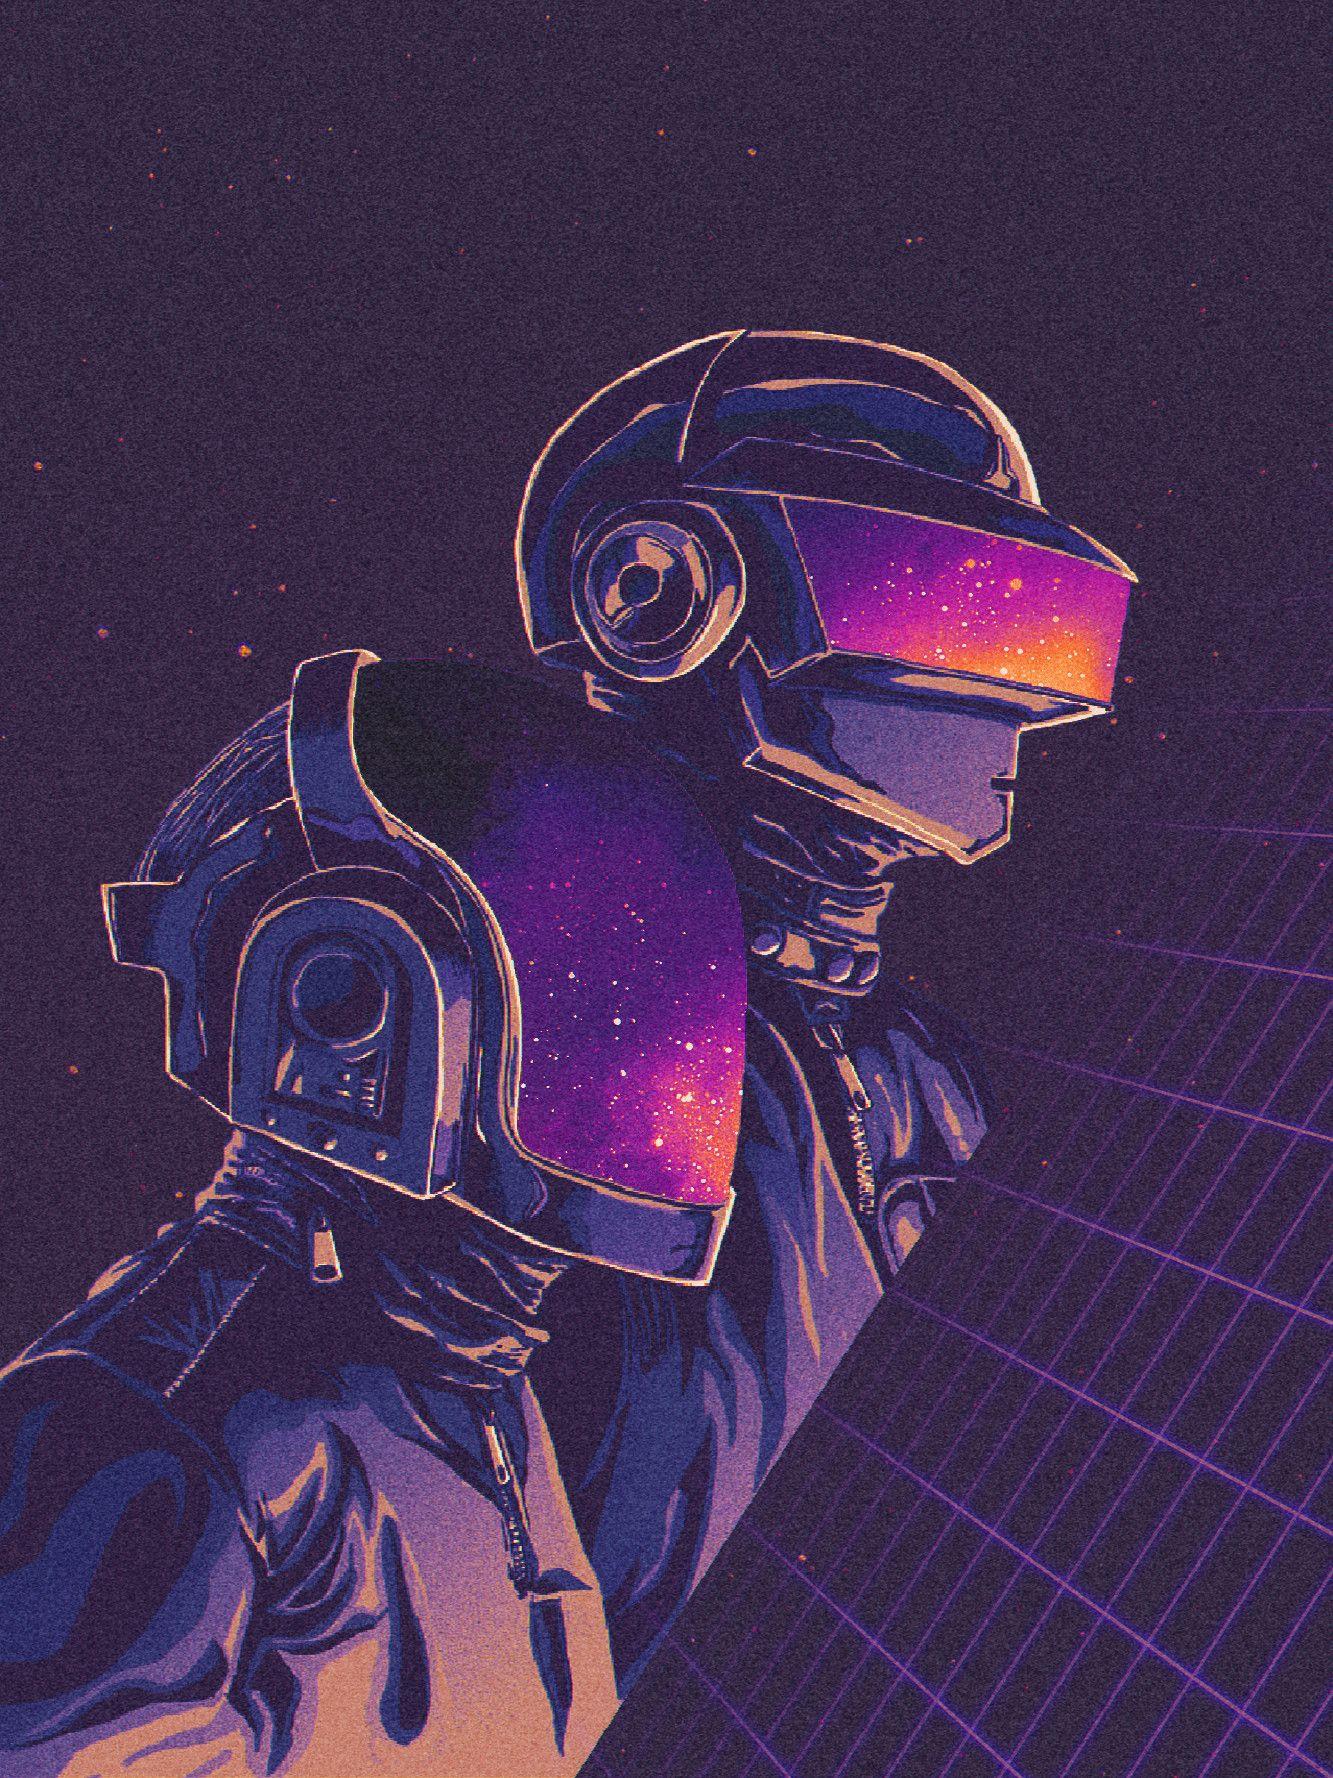 Daft Punk About Space Odyssey Pixel Lime Daft Punk Poster Retro Art Daft Punk